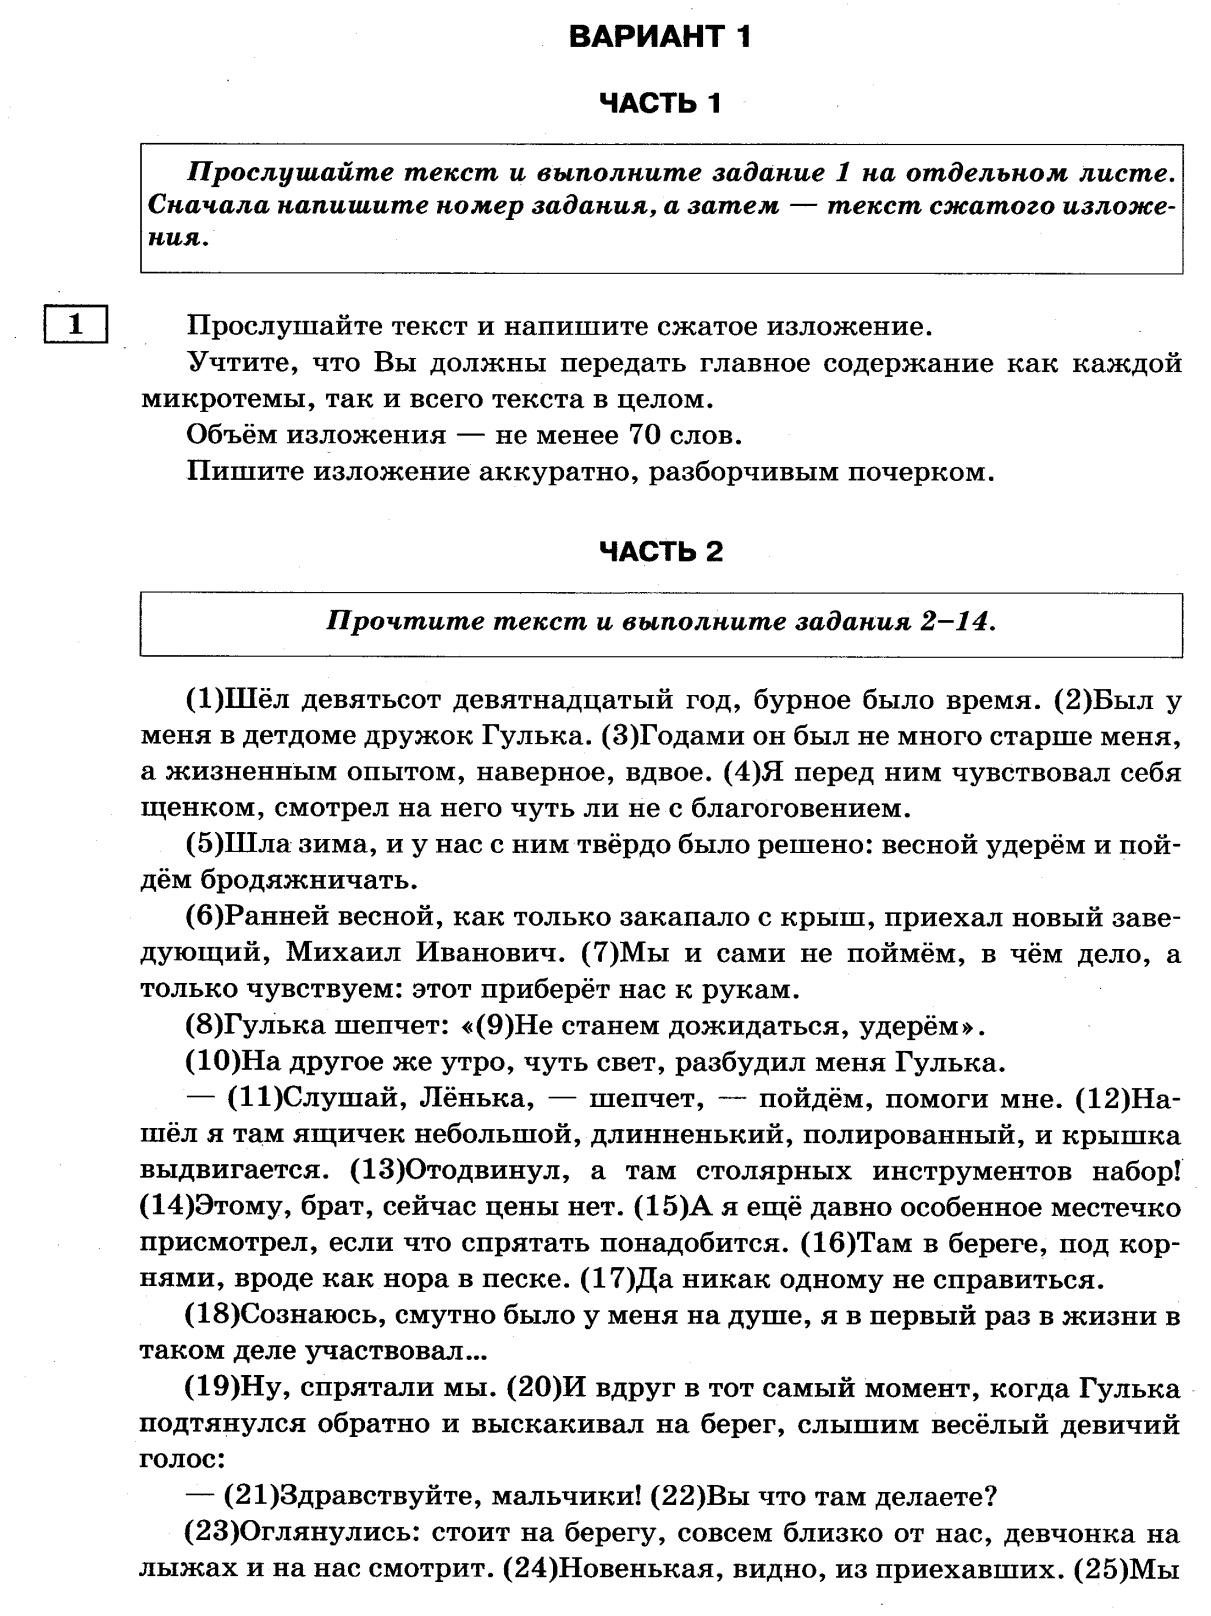 C:\Documents and Settings\Наташа\Рабочий стол\ОГЭ 2016\КИМы Степановой ОГЭ-2016\img283.jpg